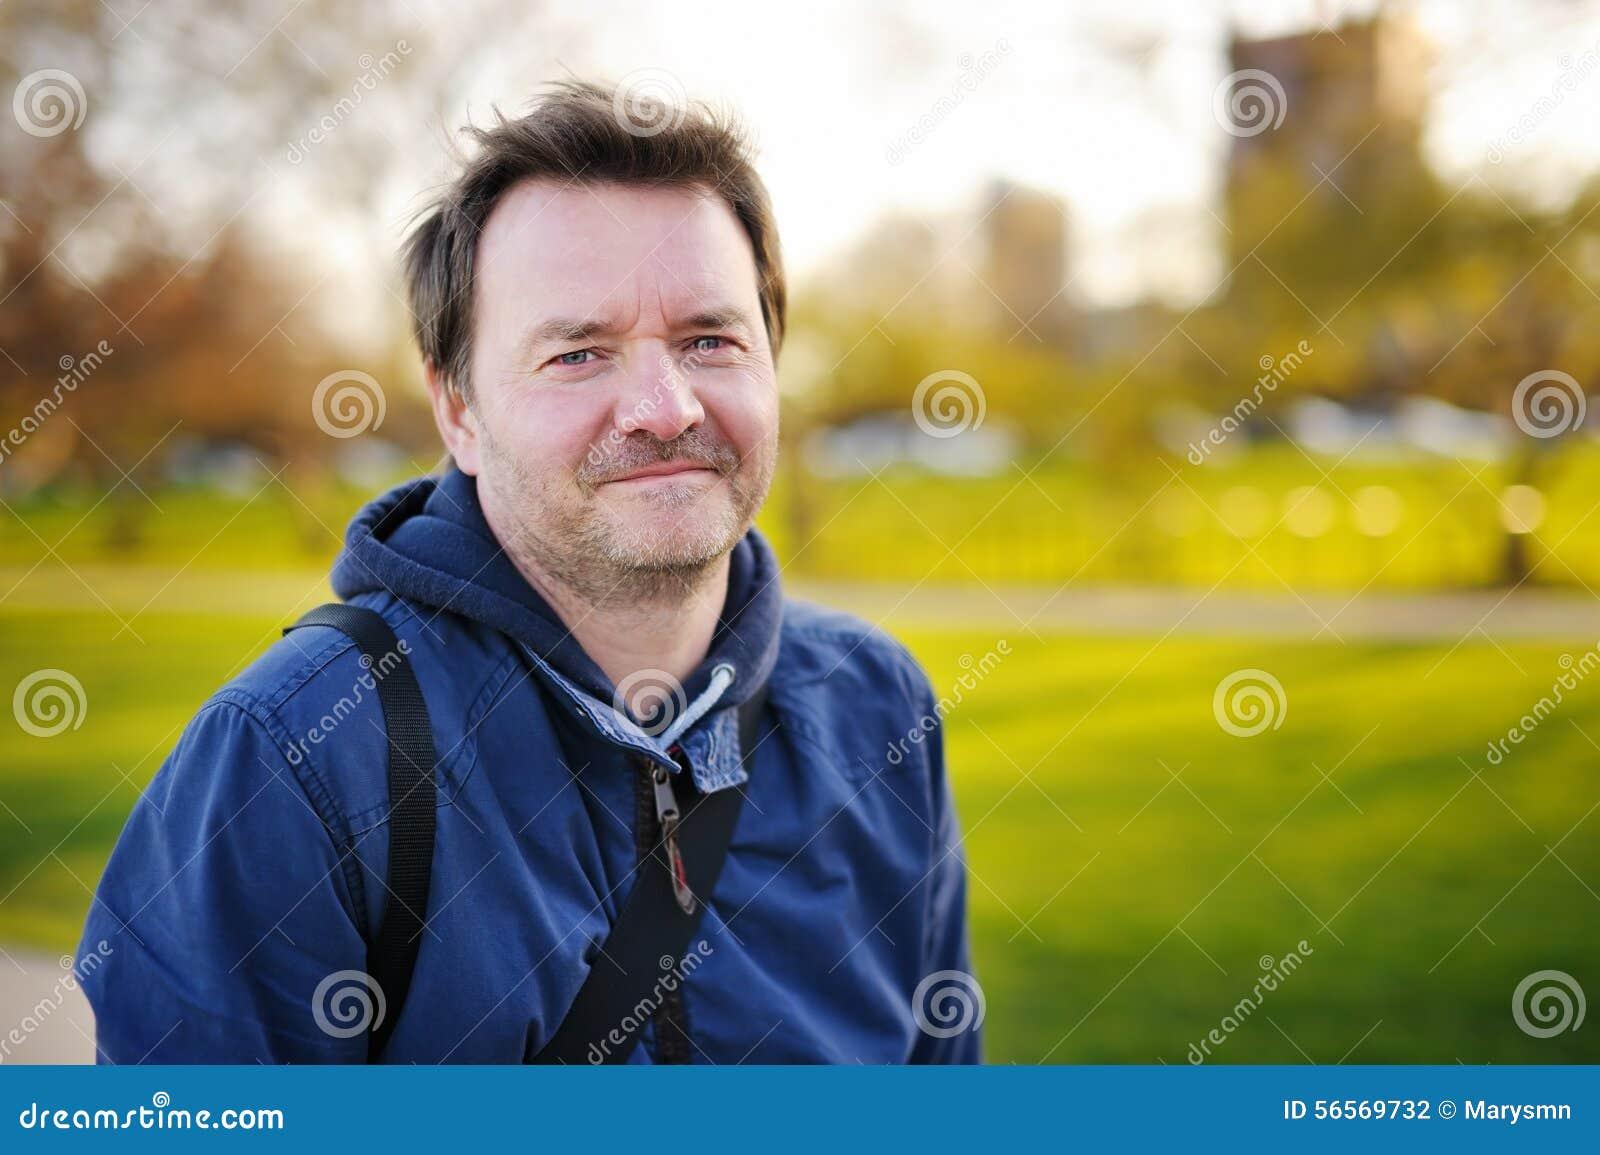 Download Υπαίθρια πορτρέτο του ατόμου Μεσαίωνα Στοκ Εικόνες - εικόνα από πηγούνι, όμορφος: 56569732